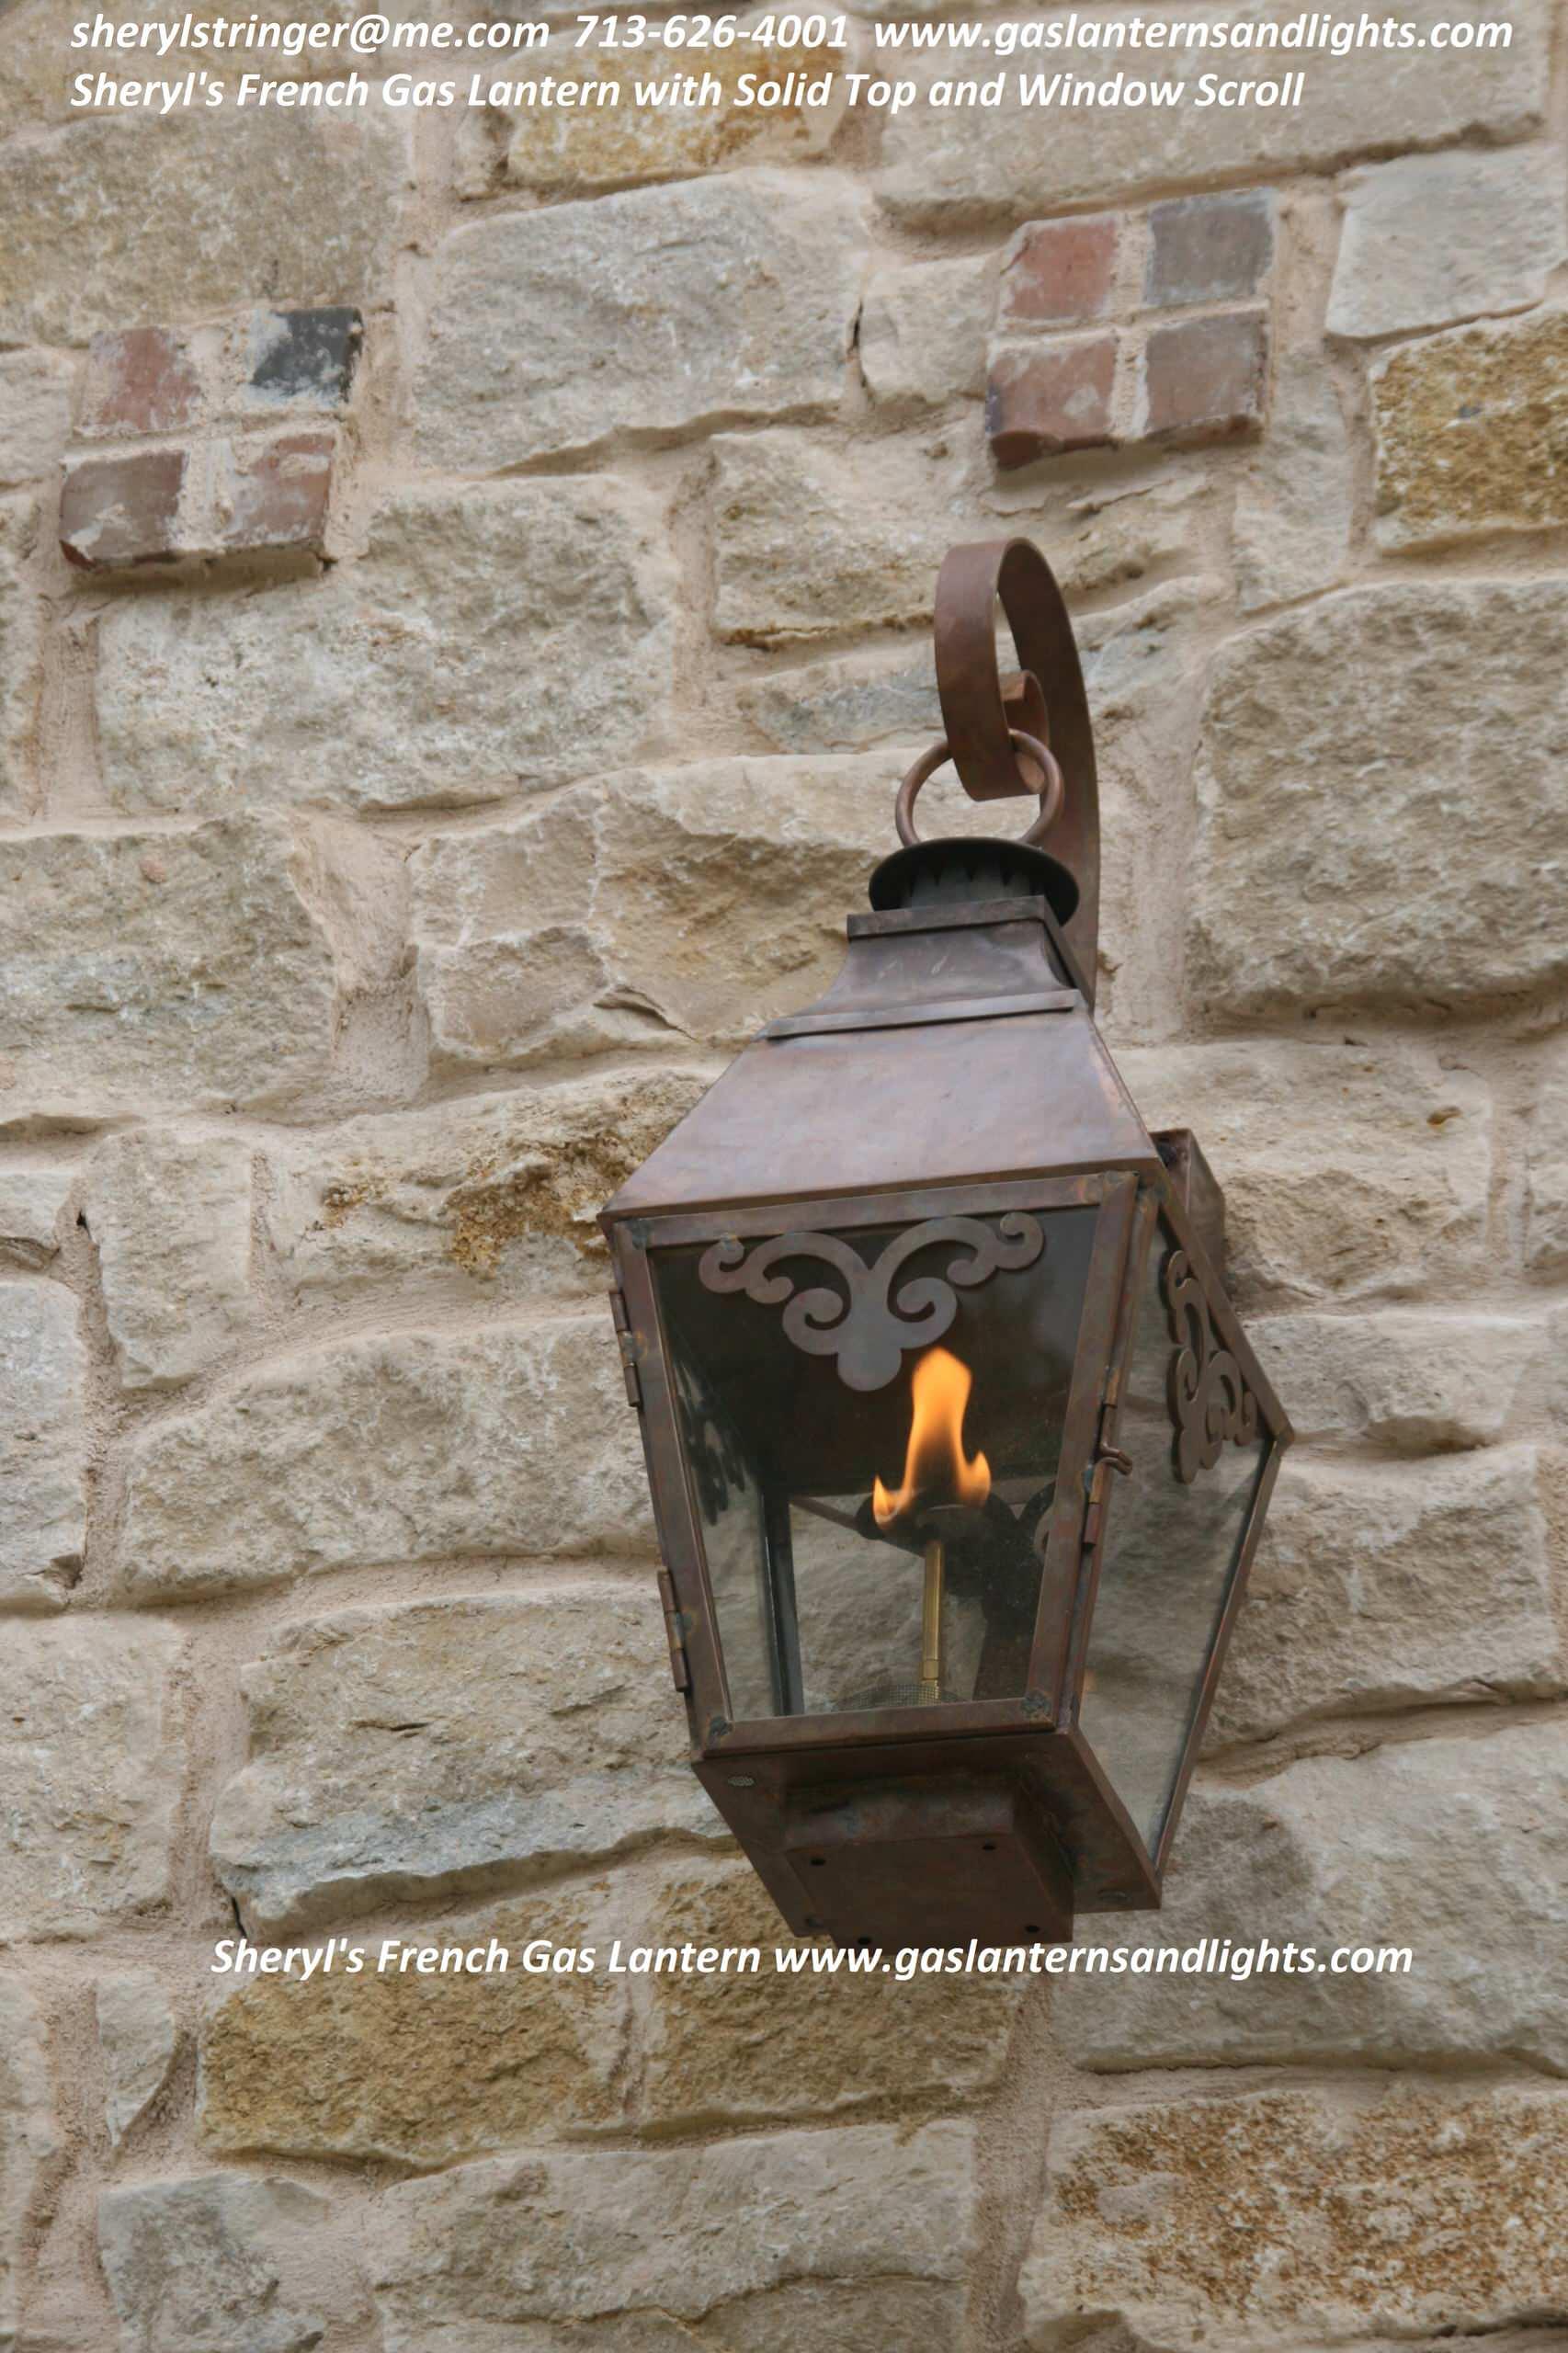 Sheryl's French Gas Lantern with Window Scrolls